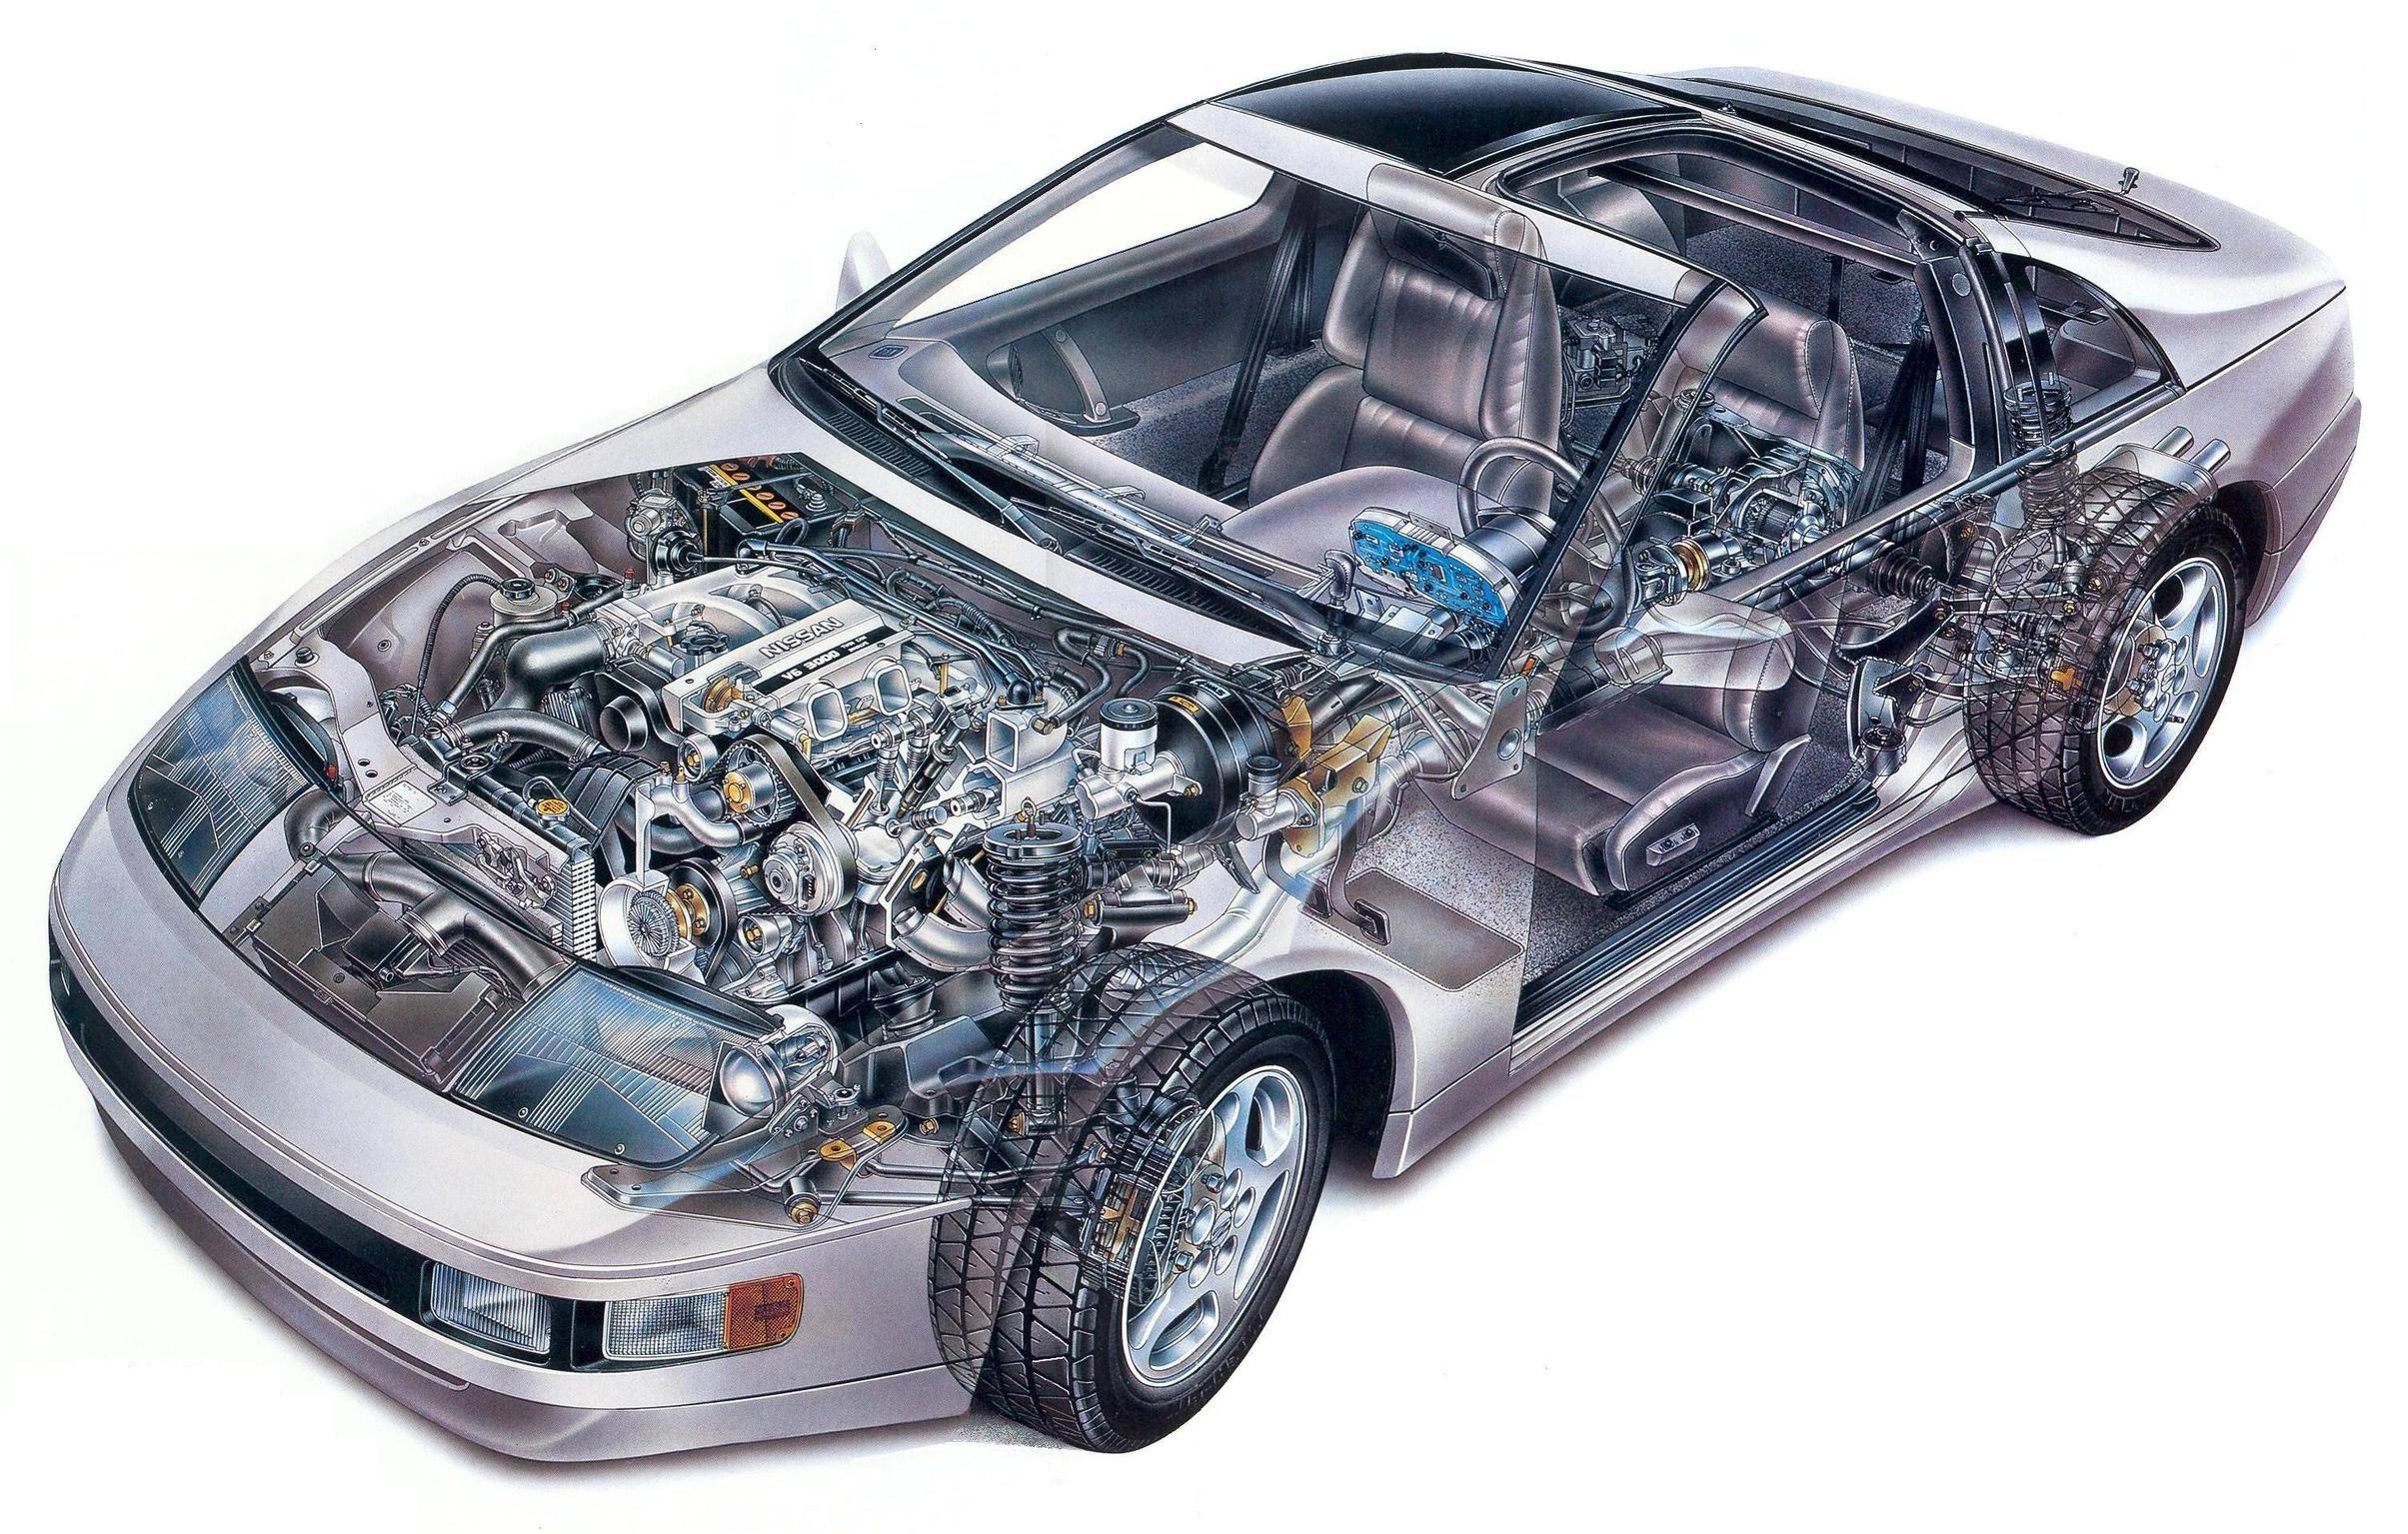 nissan 300zx z32 vehicle cutaways pinterest nissan 300zx rh pinterest co uk 1996 nissan 300zx owners manual pdf 1996 nissan 300zx owners manual pdf